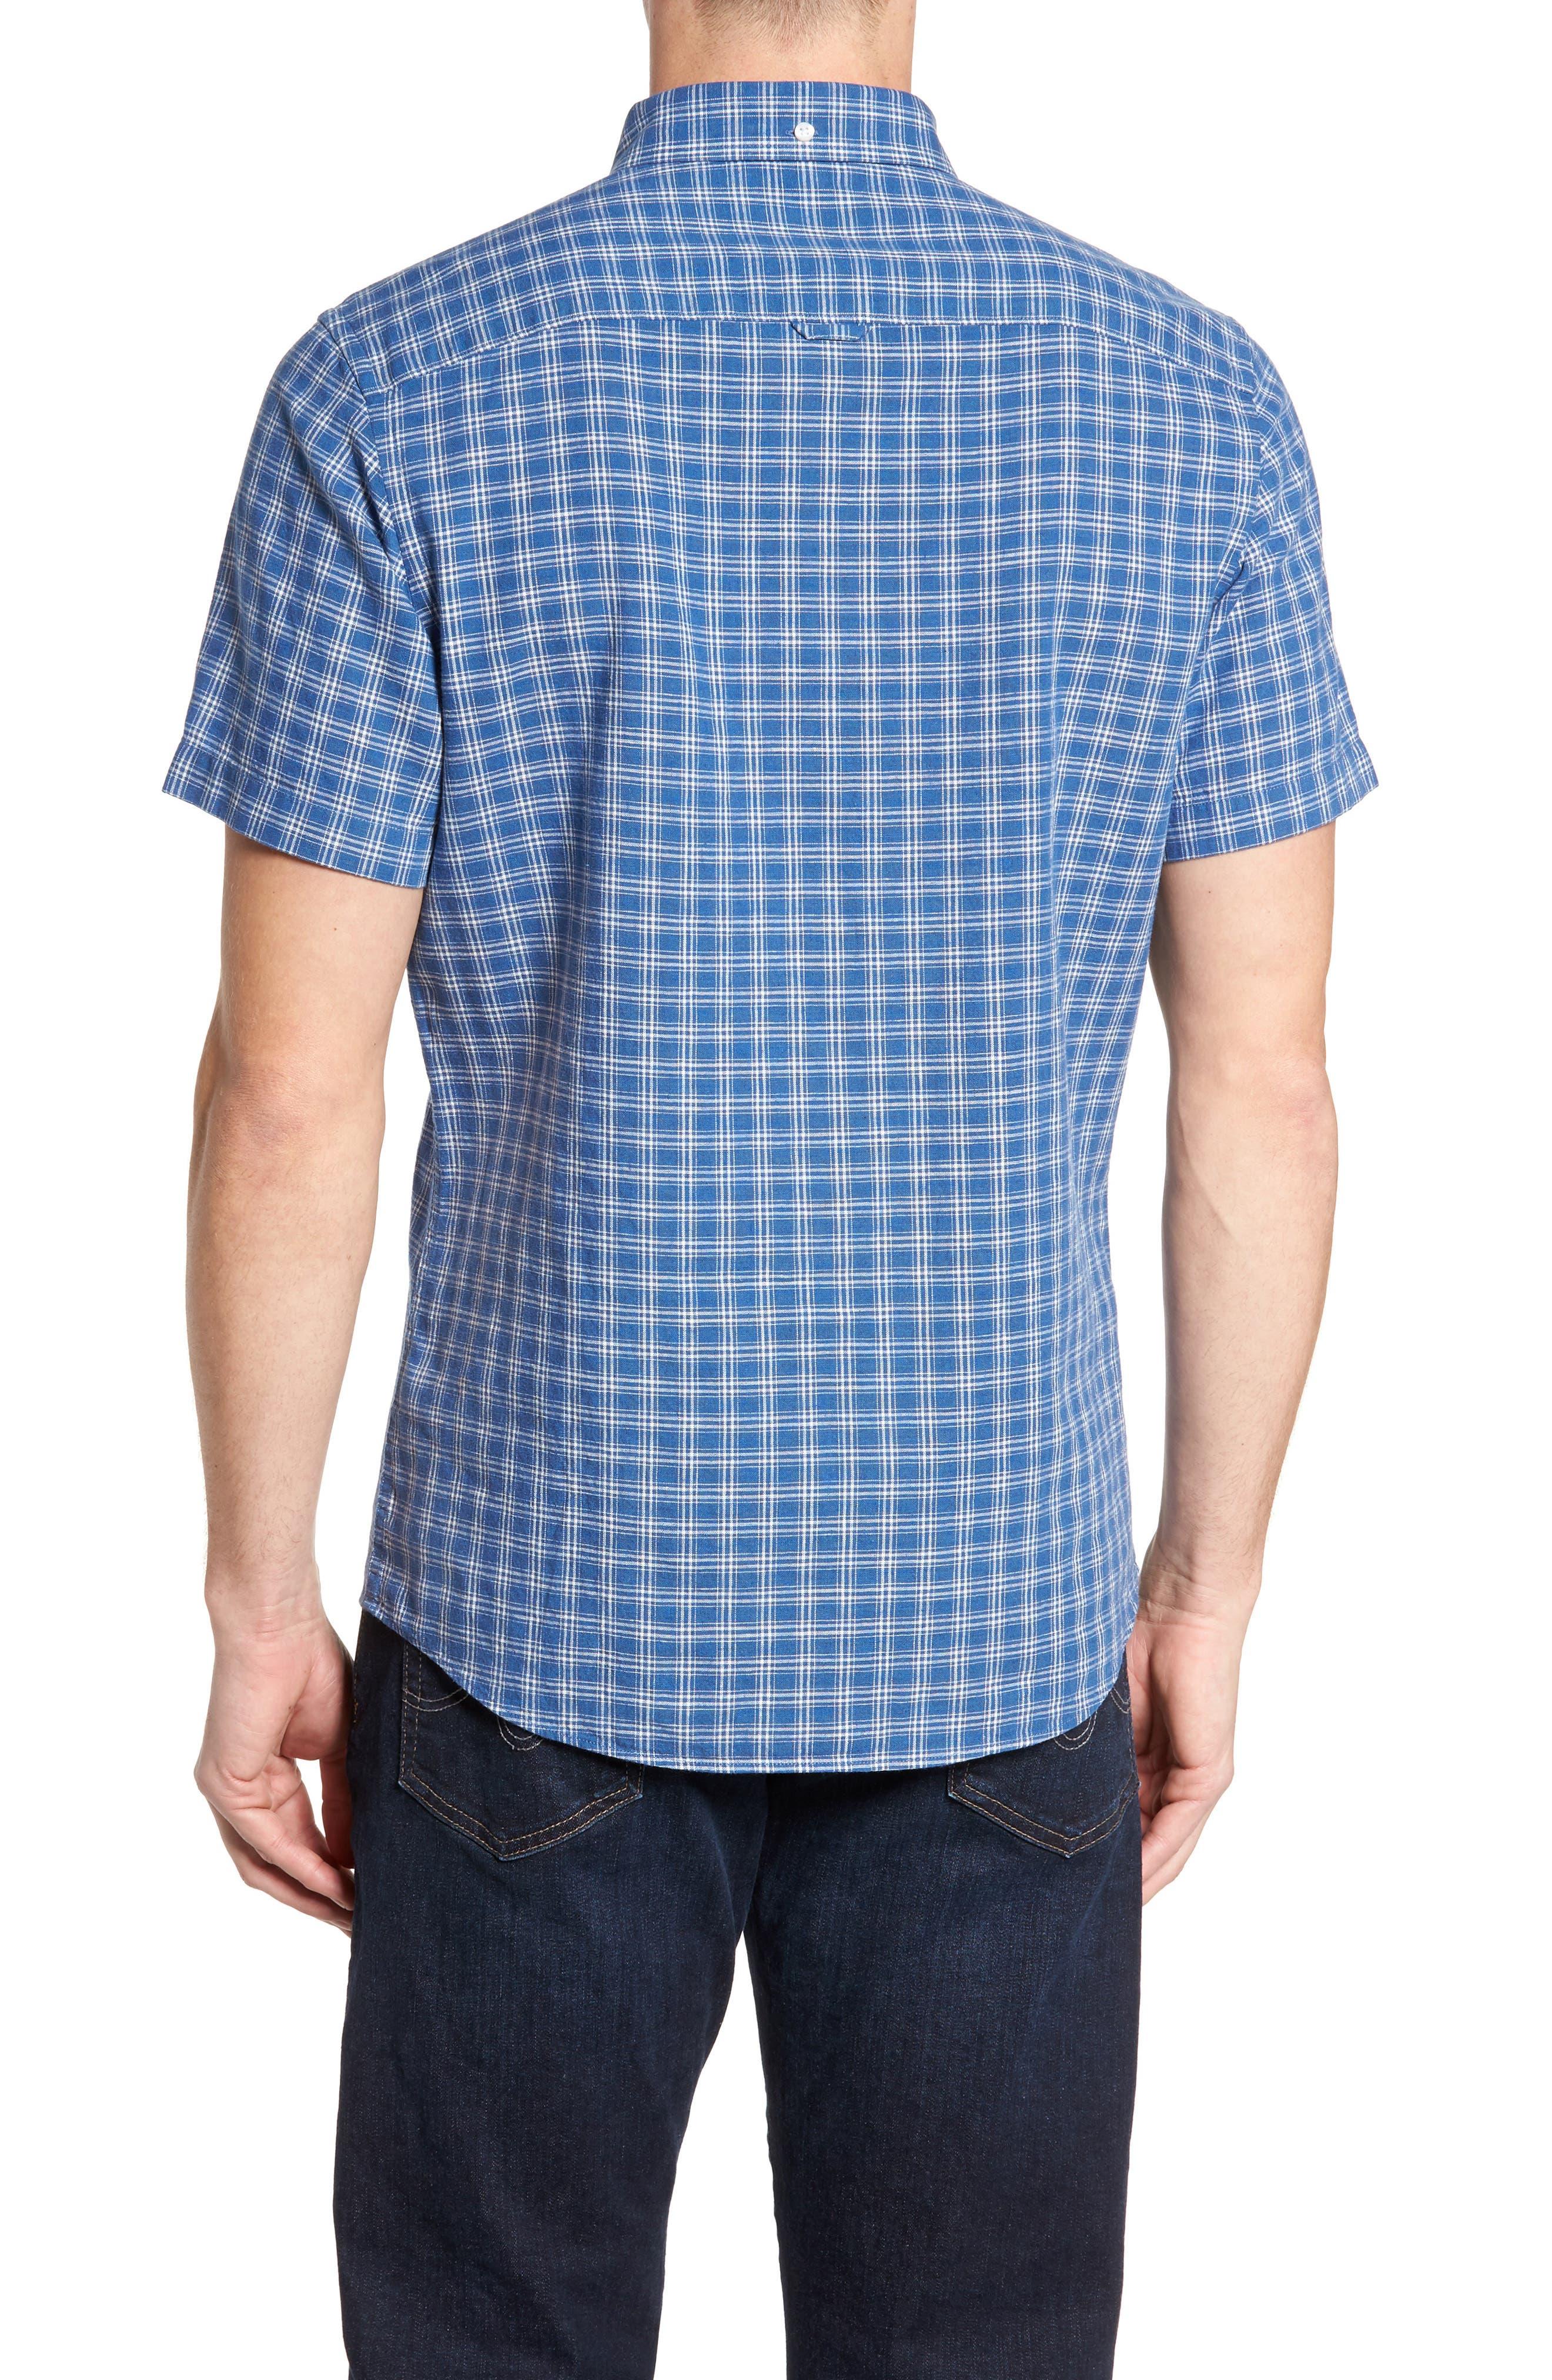 Ivy Trim Fit Check Sport Shirt,                             Alternate thumbnail 3, color,                             Blue Indigo White Plaid